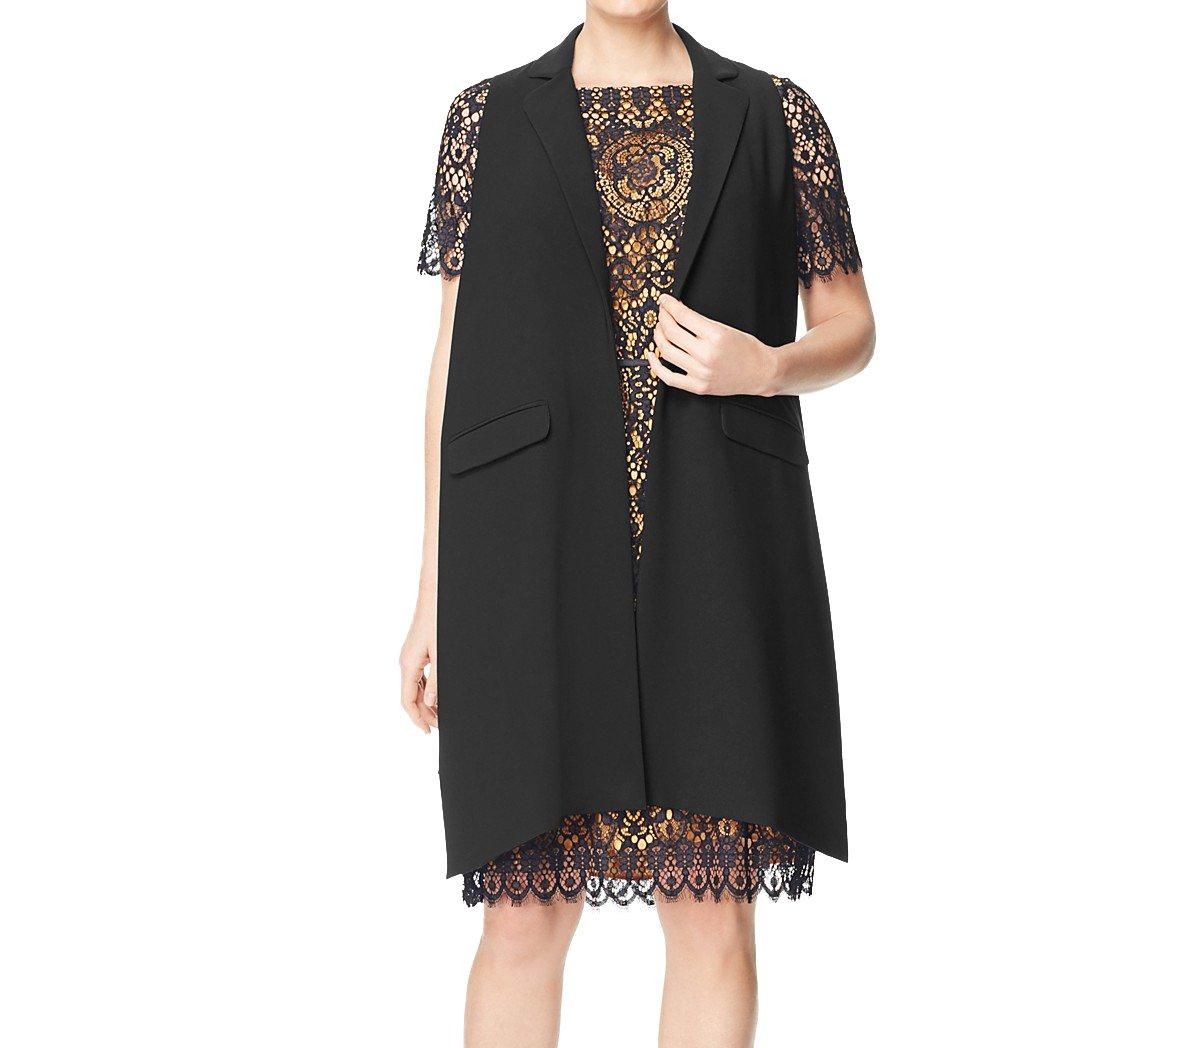 Marina Rinaldi Women's Caterina Open Style Vest, Black, 18W/27